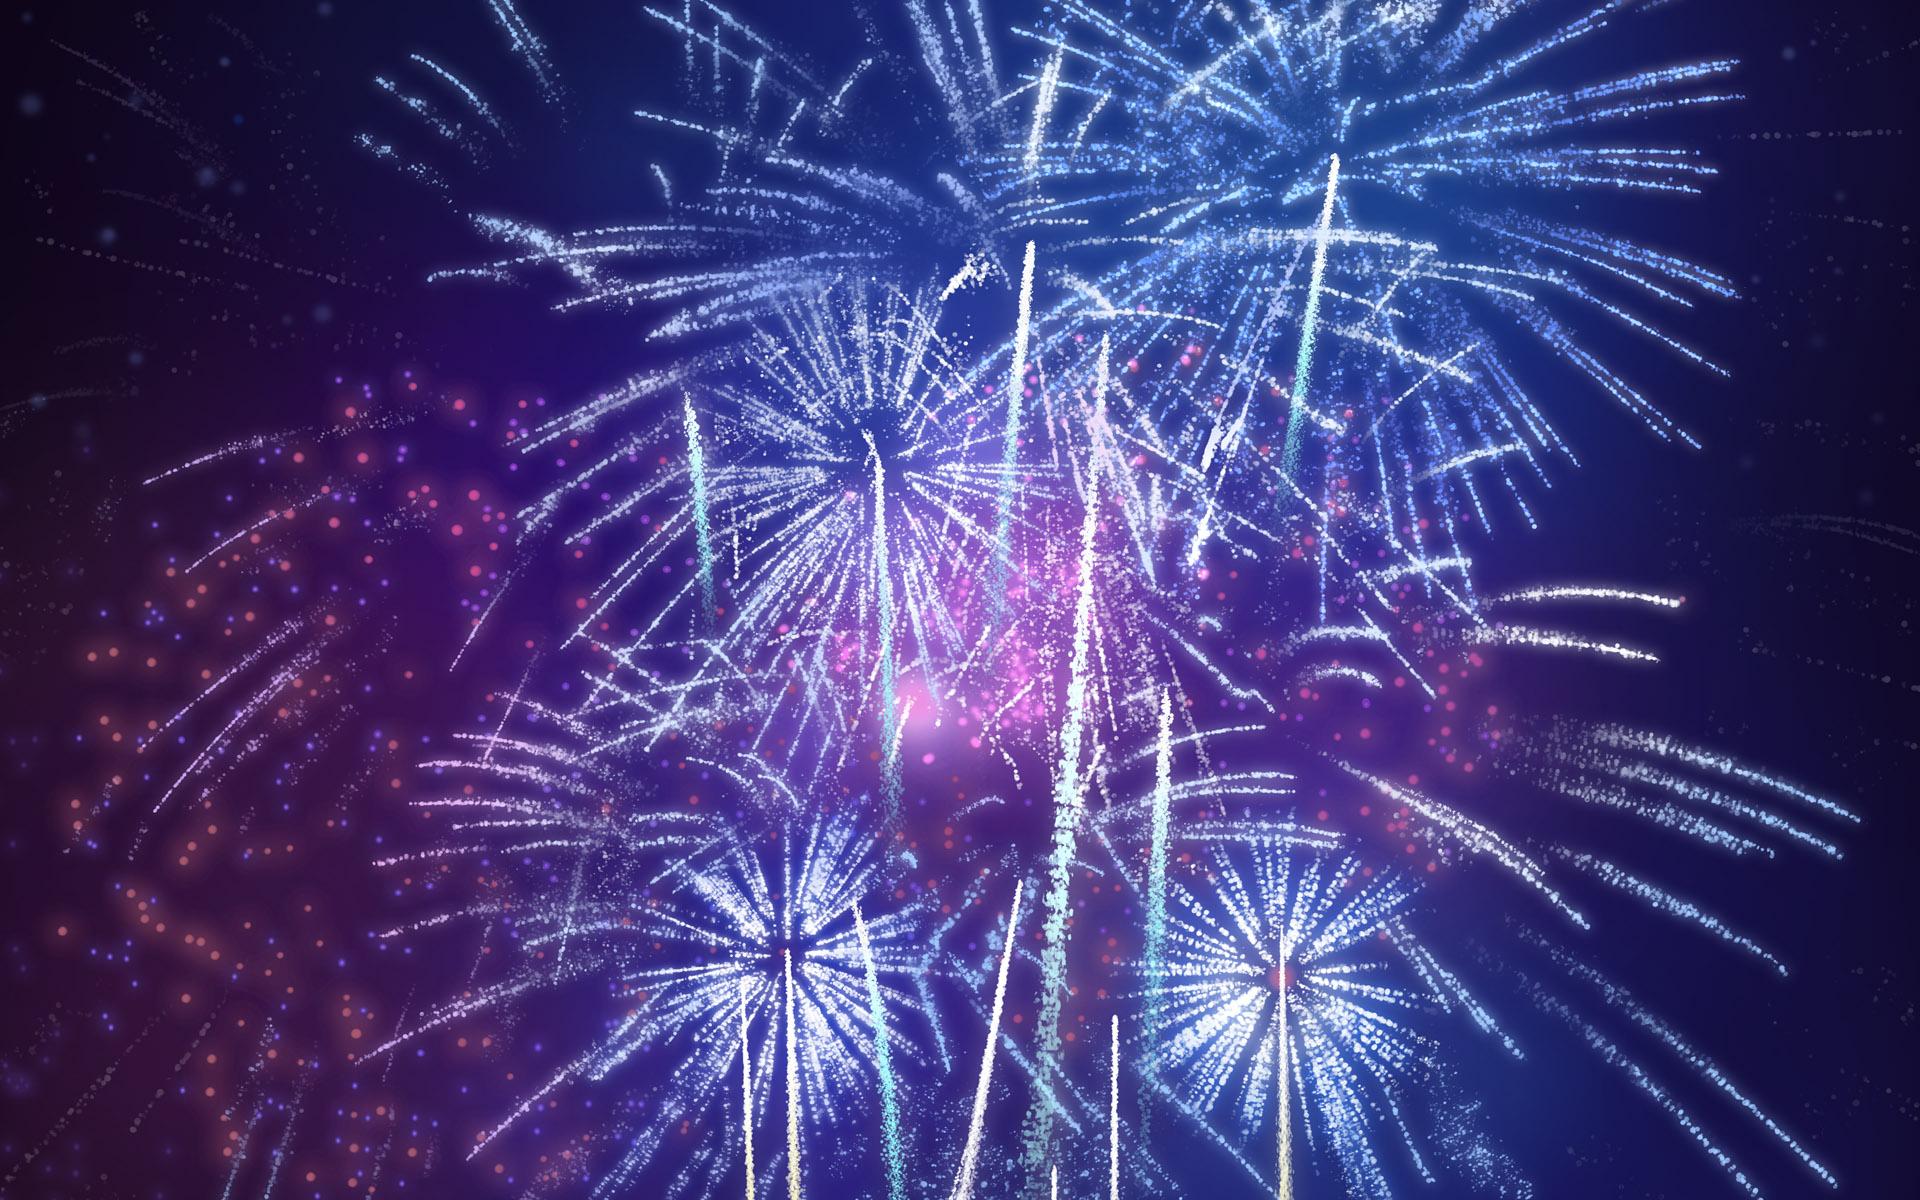 Fireworks Wallpaper: Wallpaper Wishlist Free Desktop Wallpapers 1920x1200px